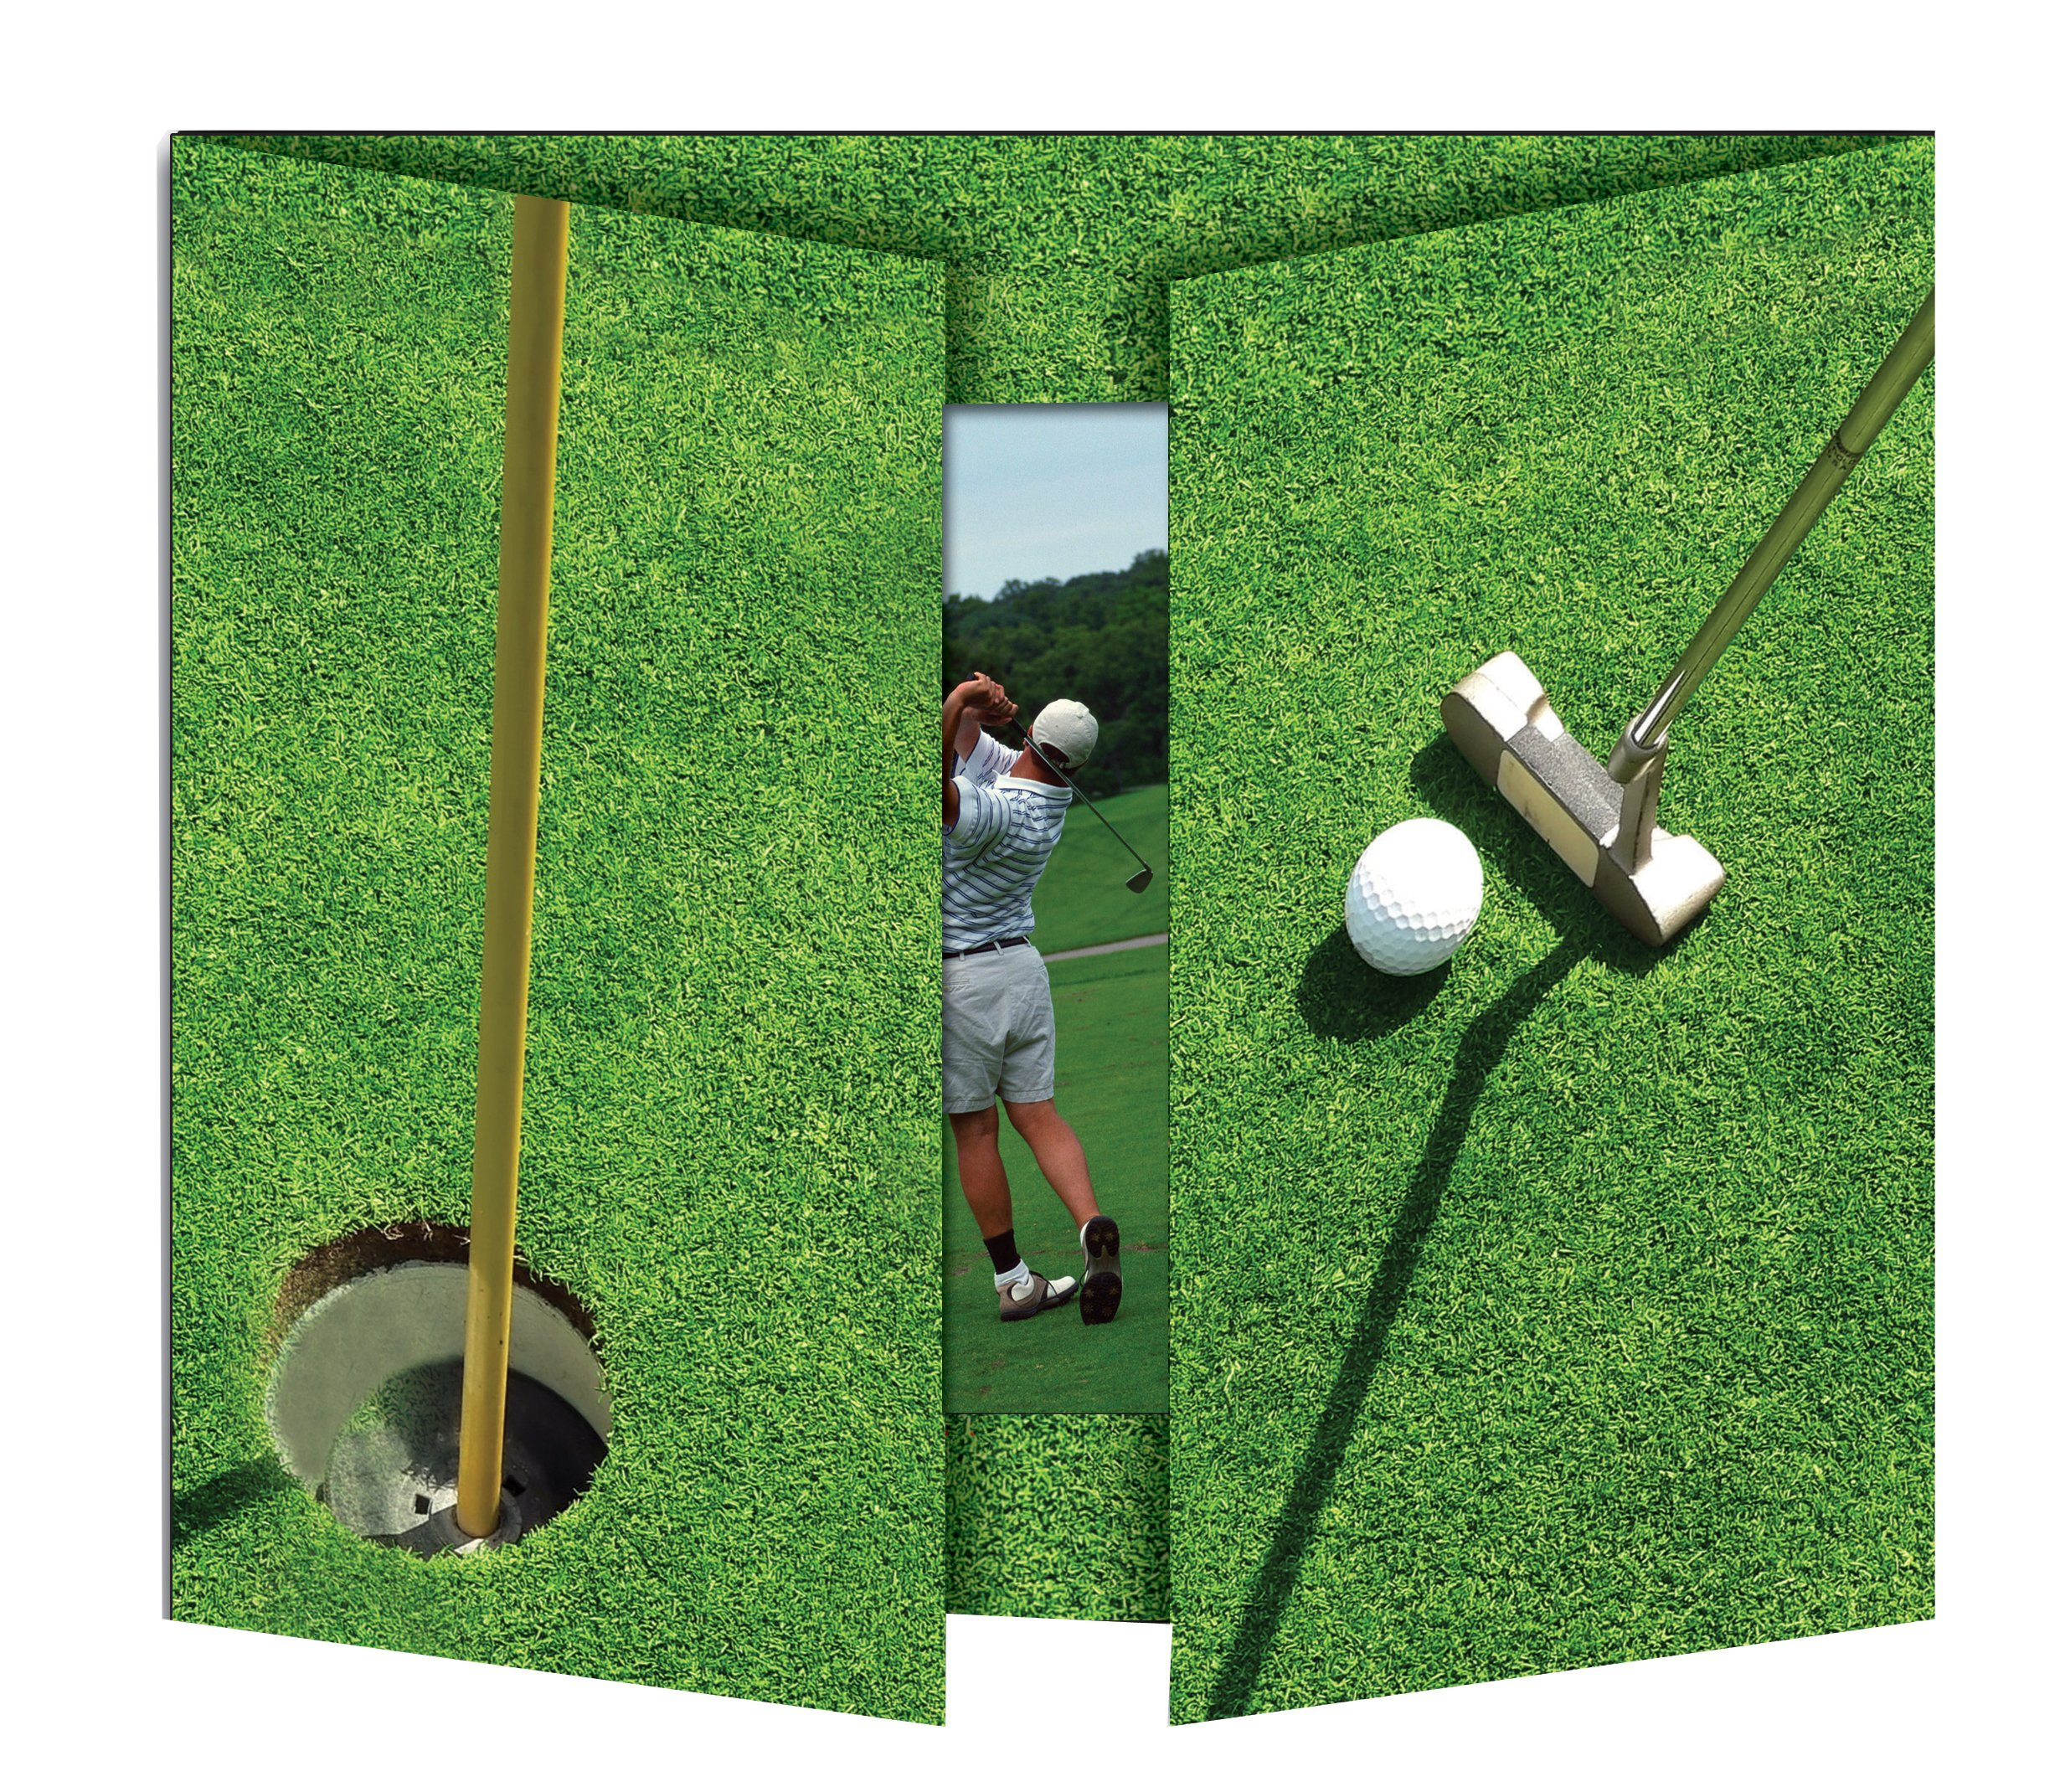 6x4 Golf Photo Folder - 100 Pack by Neil Enterprises